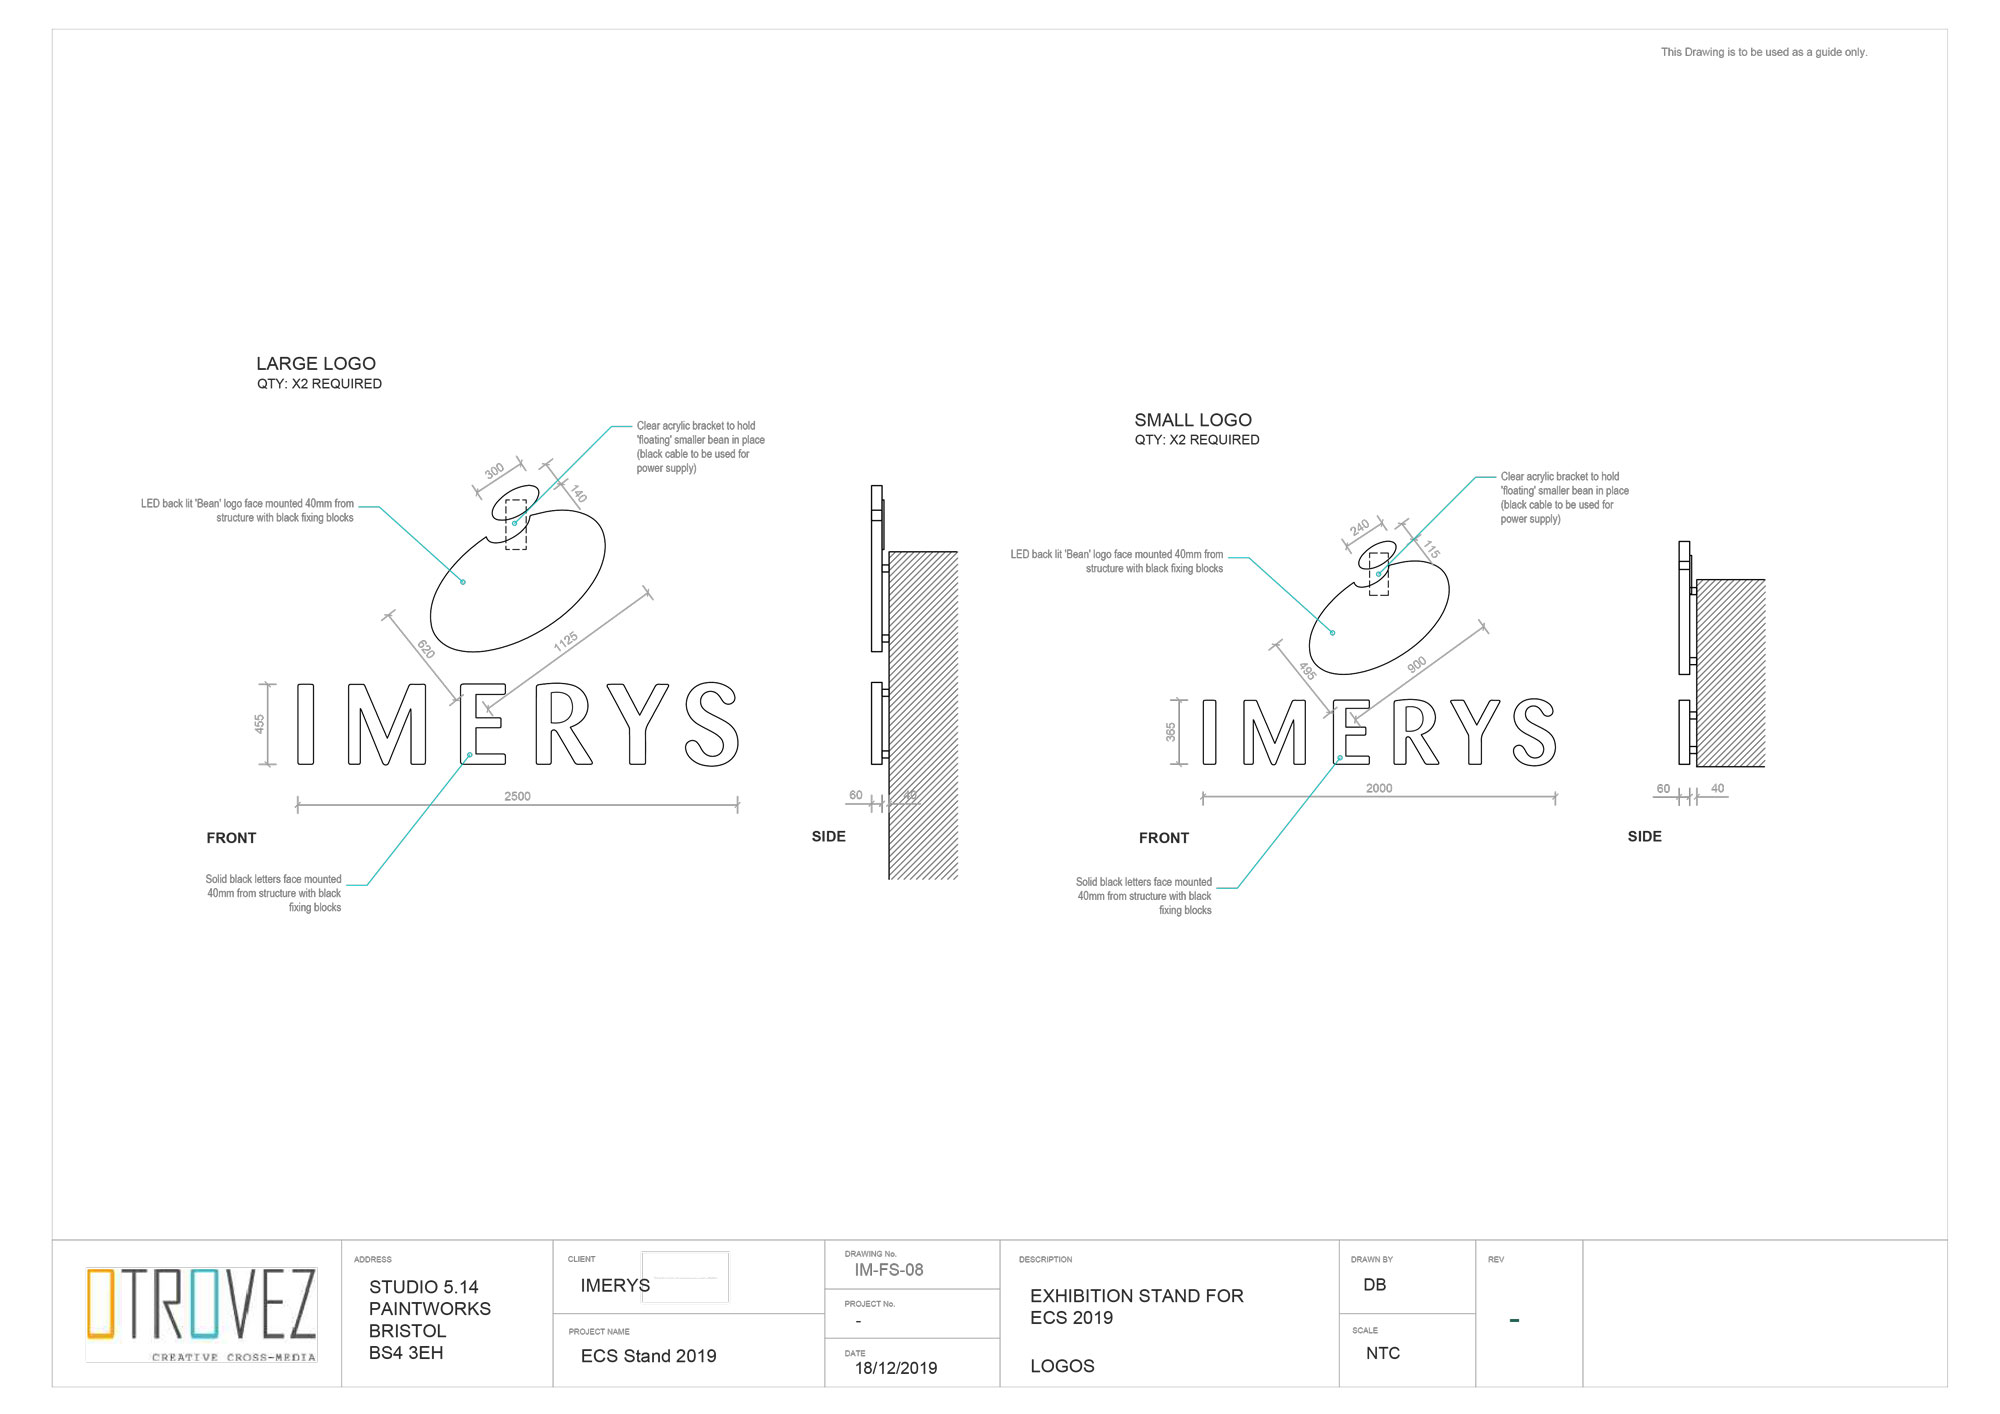 Imerys-ECS-2019---Signage-Dims_Detail-Drawings_V1-LOGOS.jpg